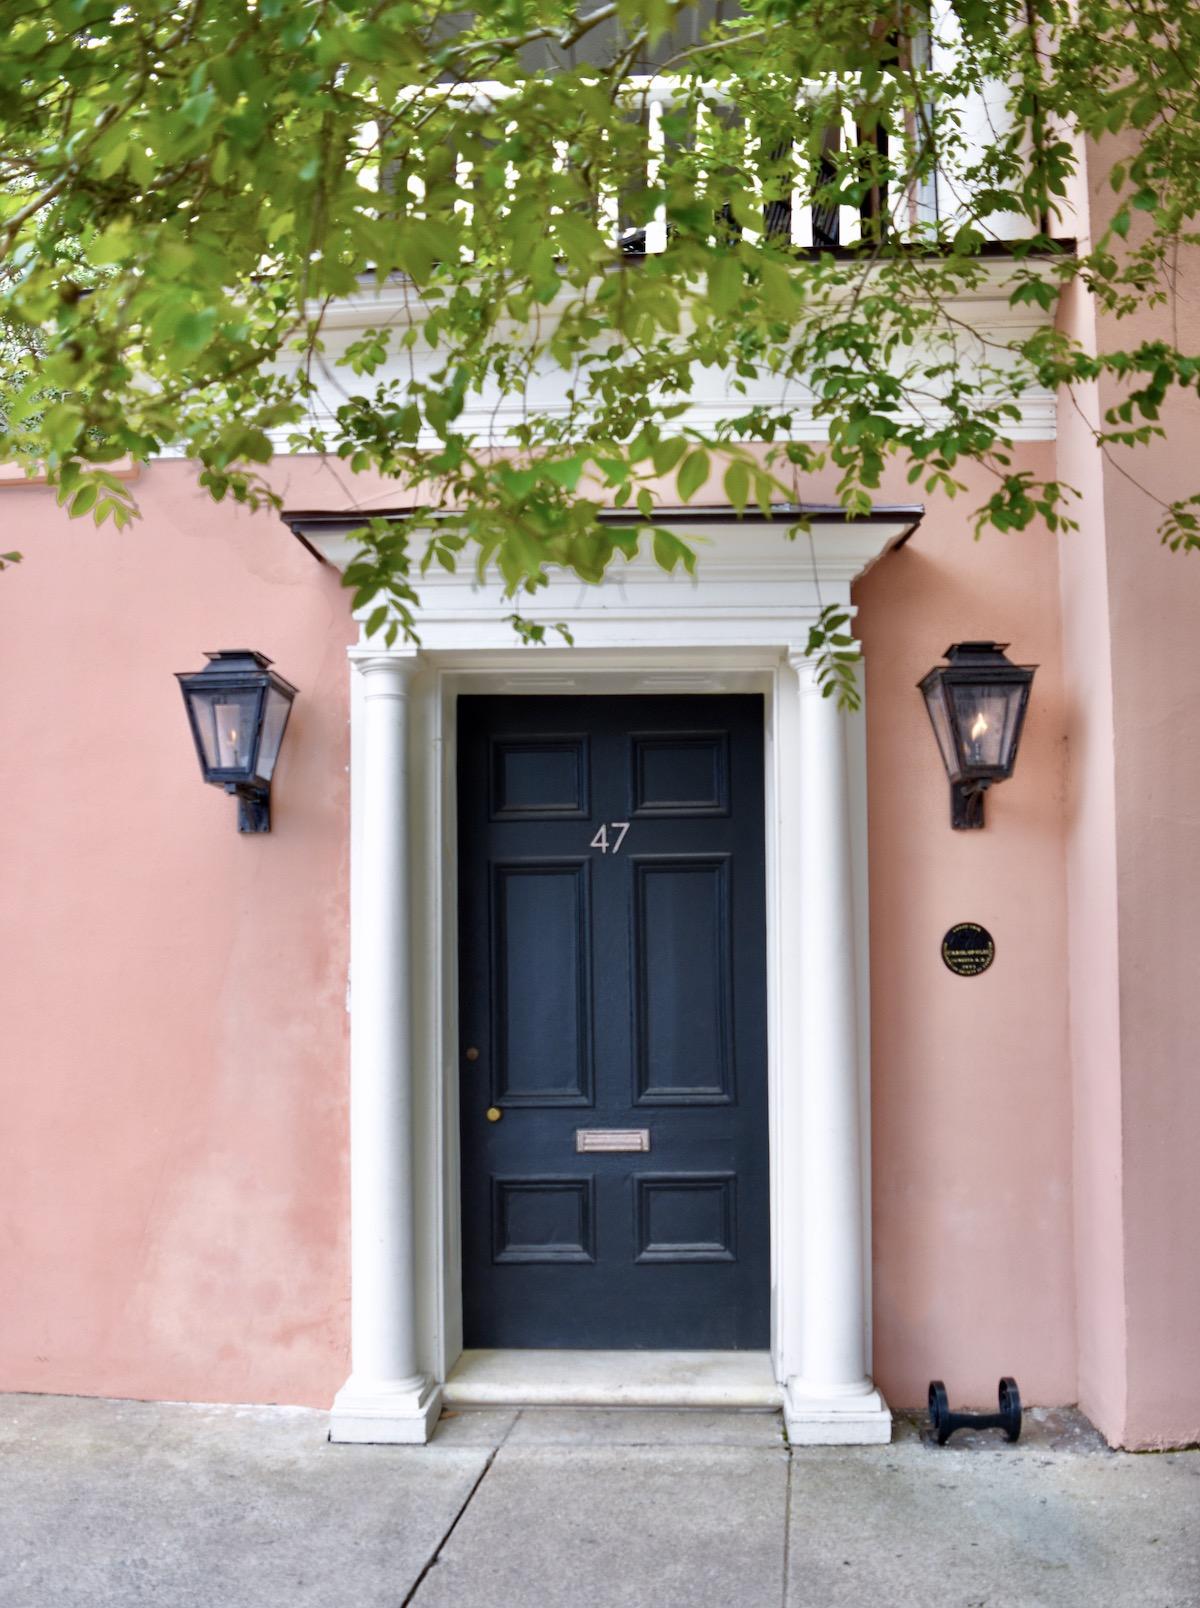 47 E Bay Street, Charleston, SC Coral House Pink House 2